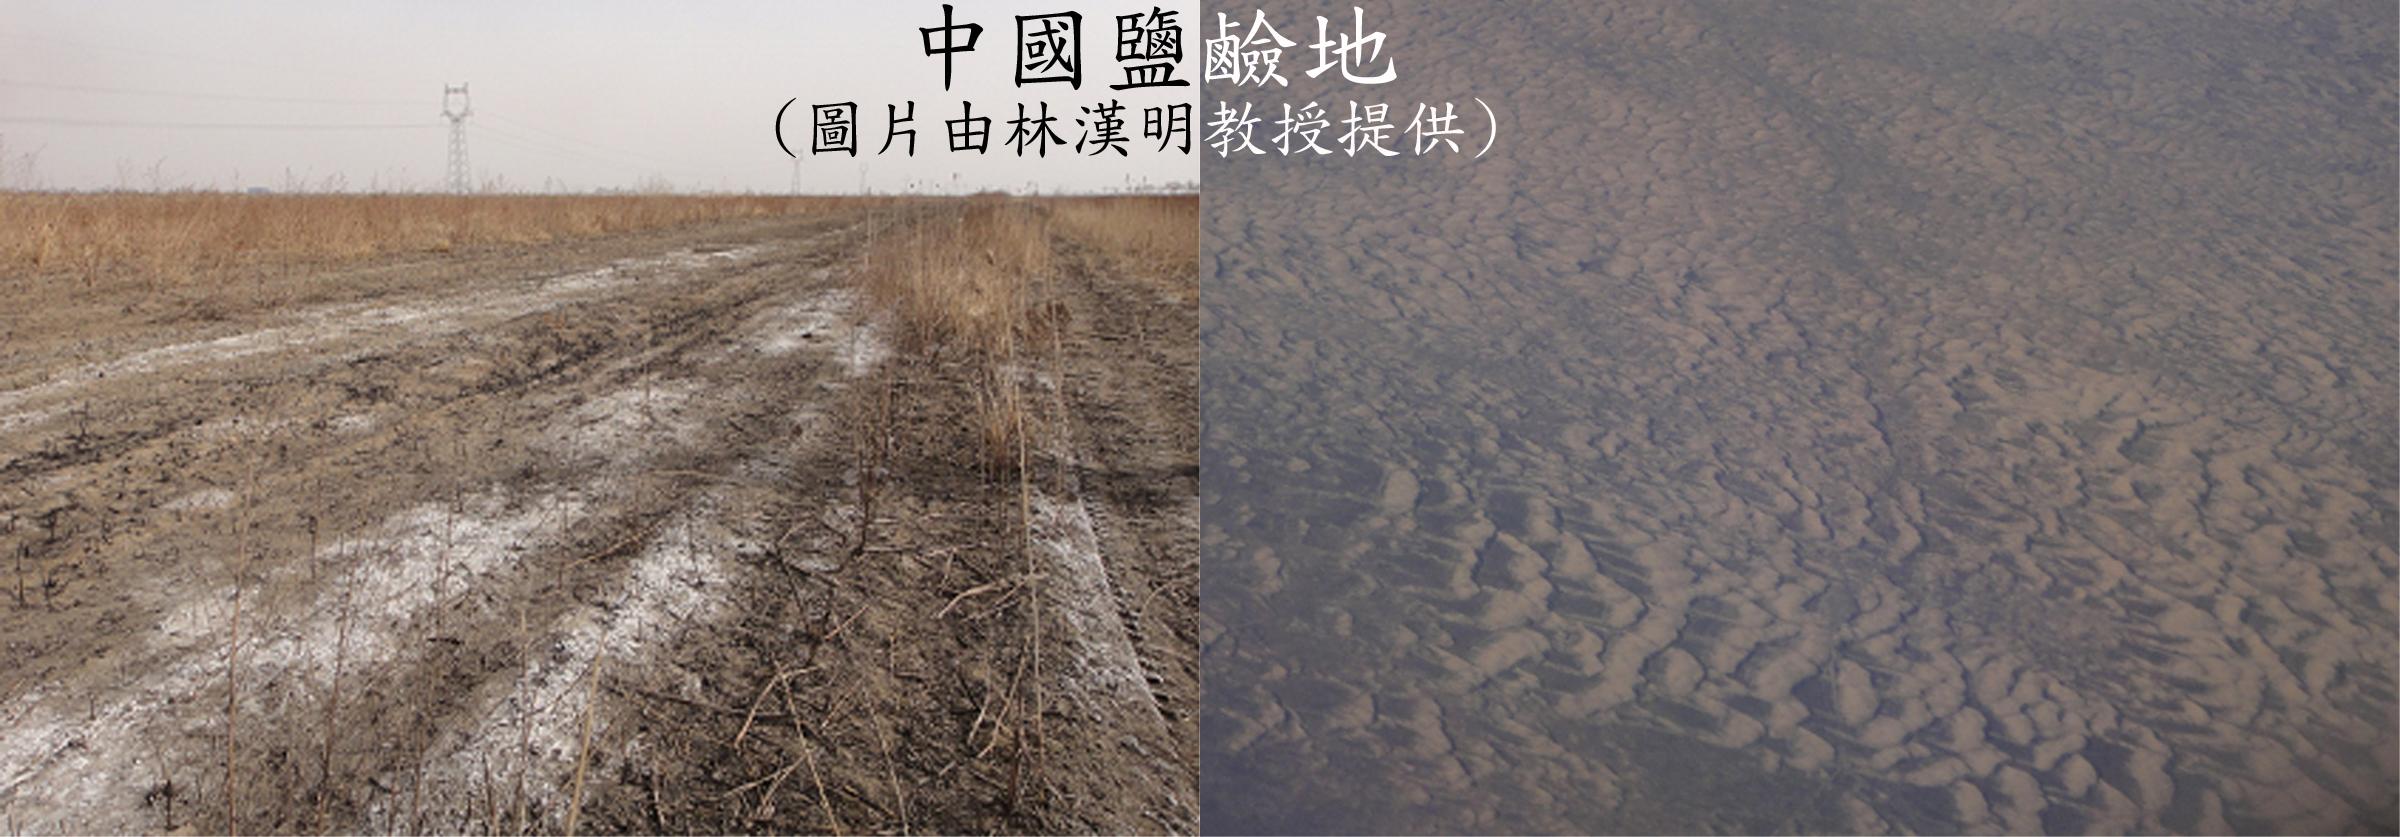 Saline lands in Northern China